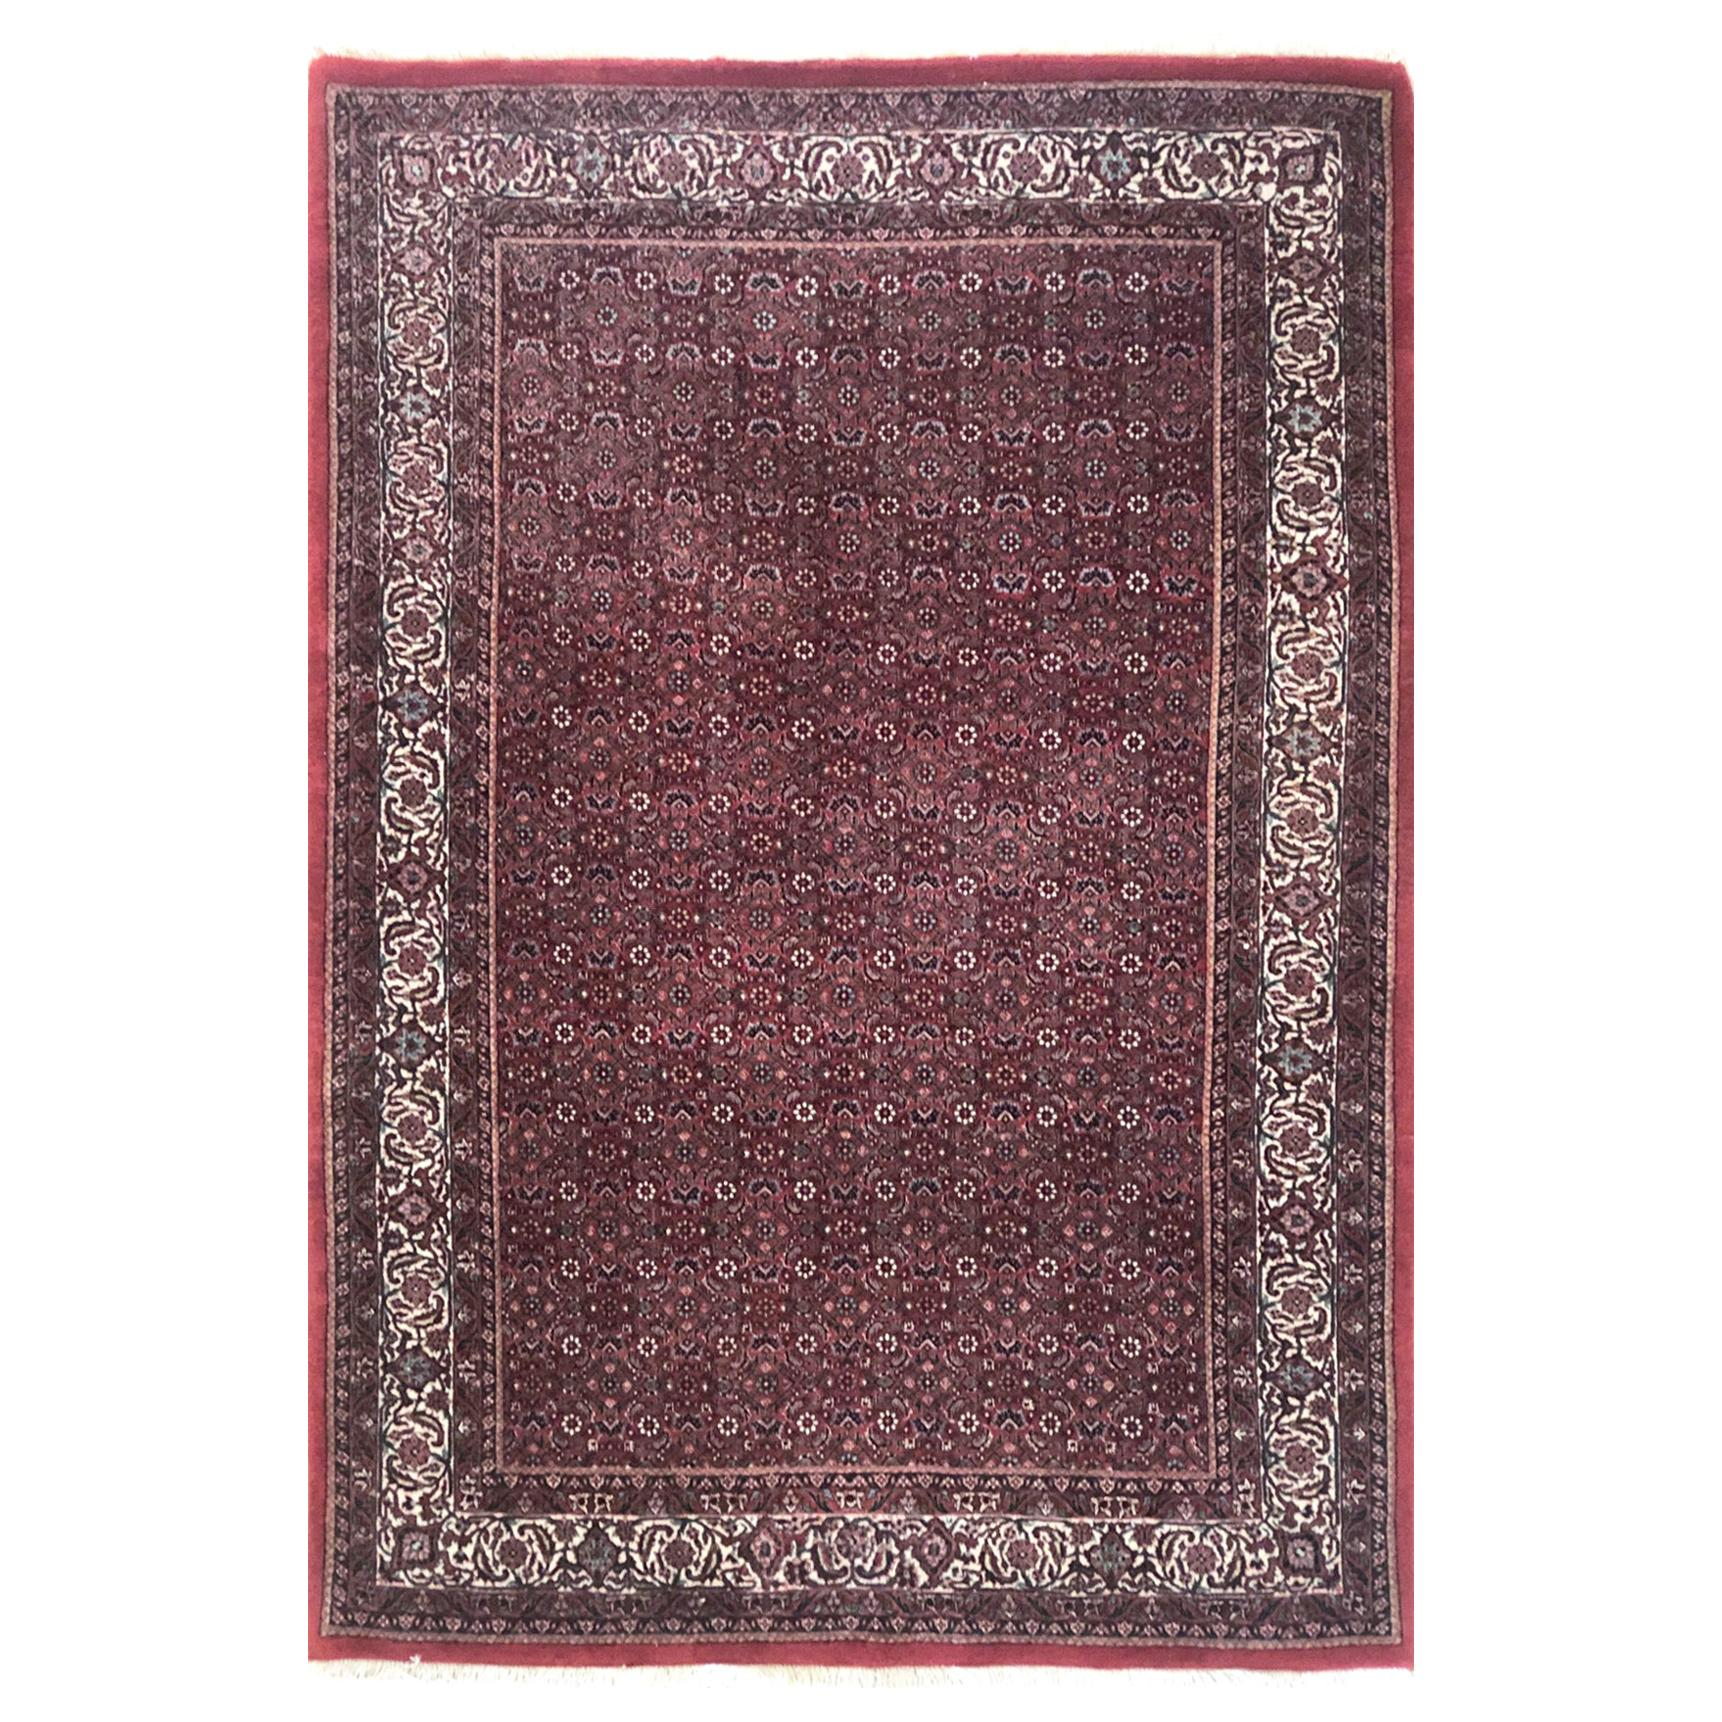 Persian Hand Knotted Red All-Over Floral Herati Design Bijar 'Bidjar' Rug